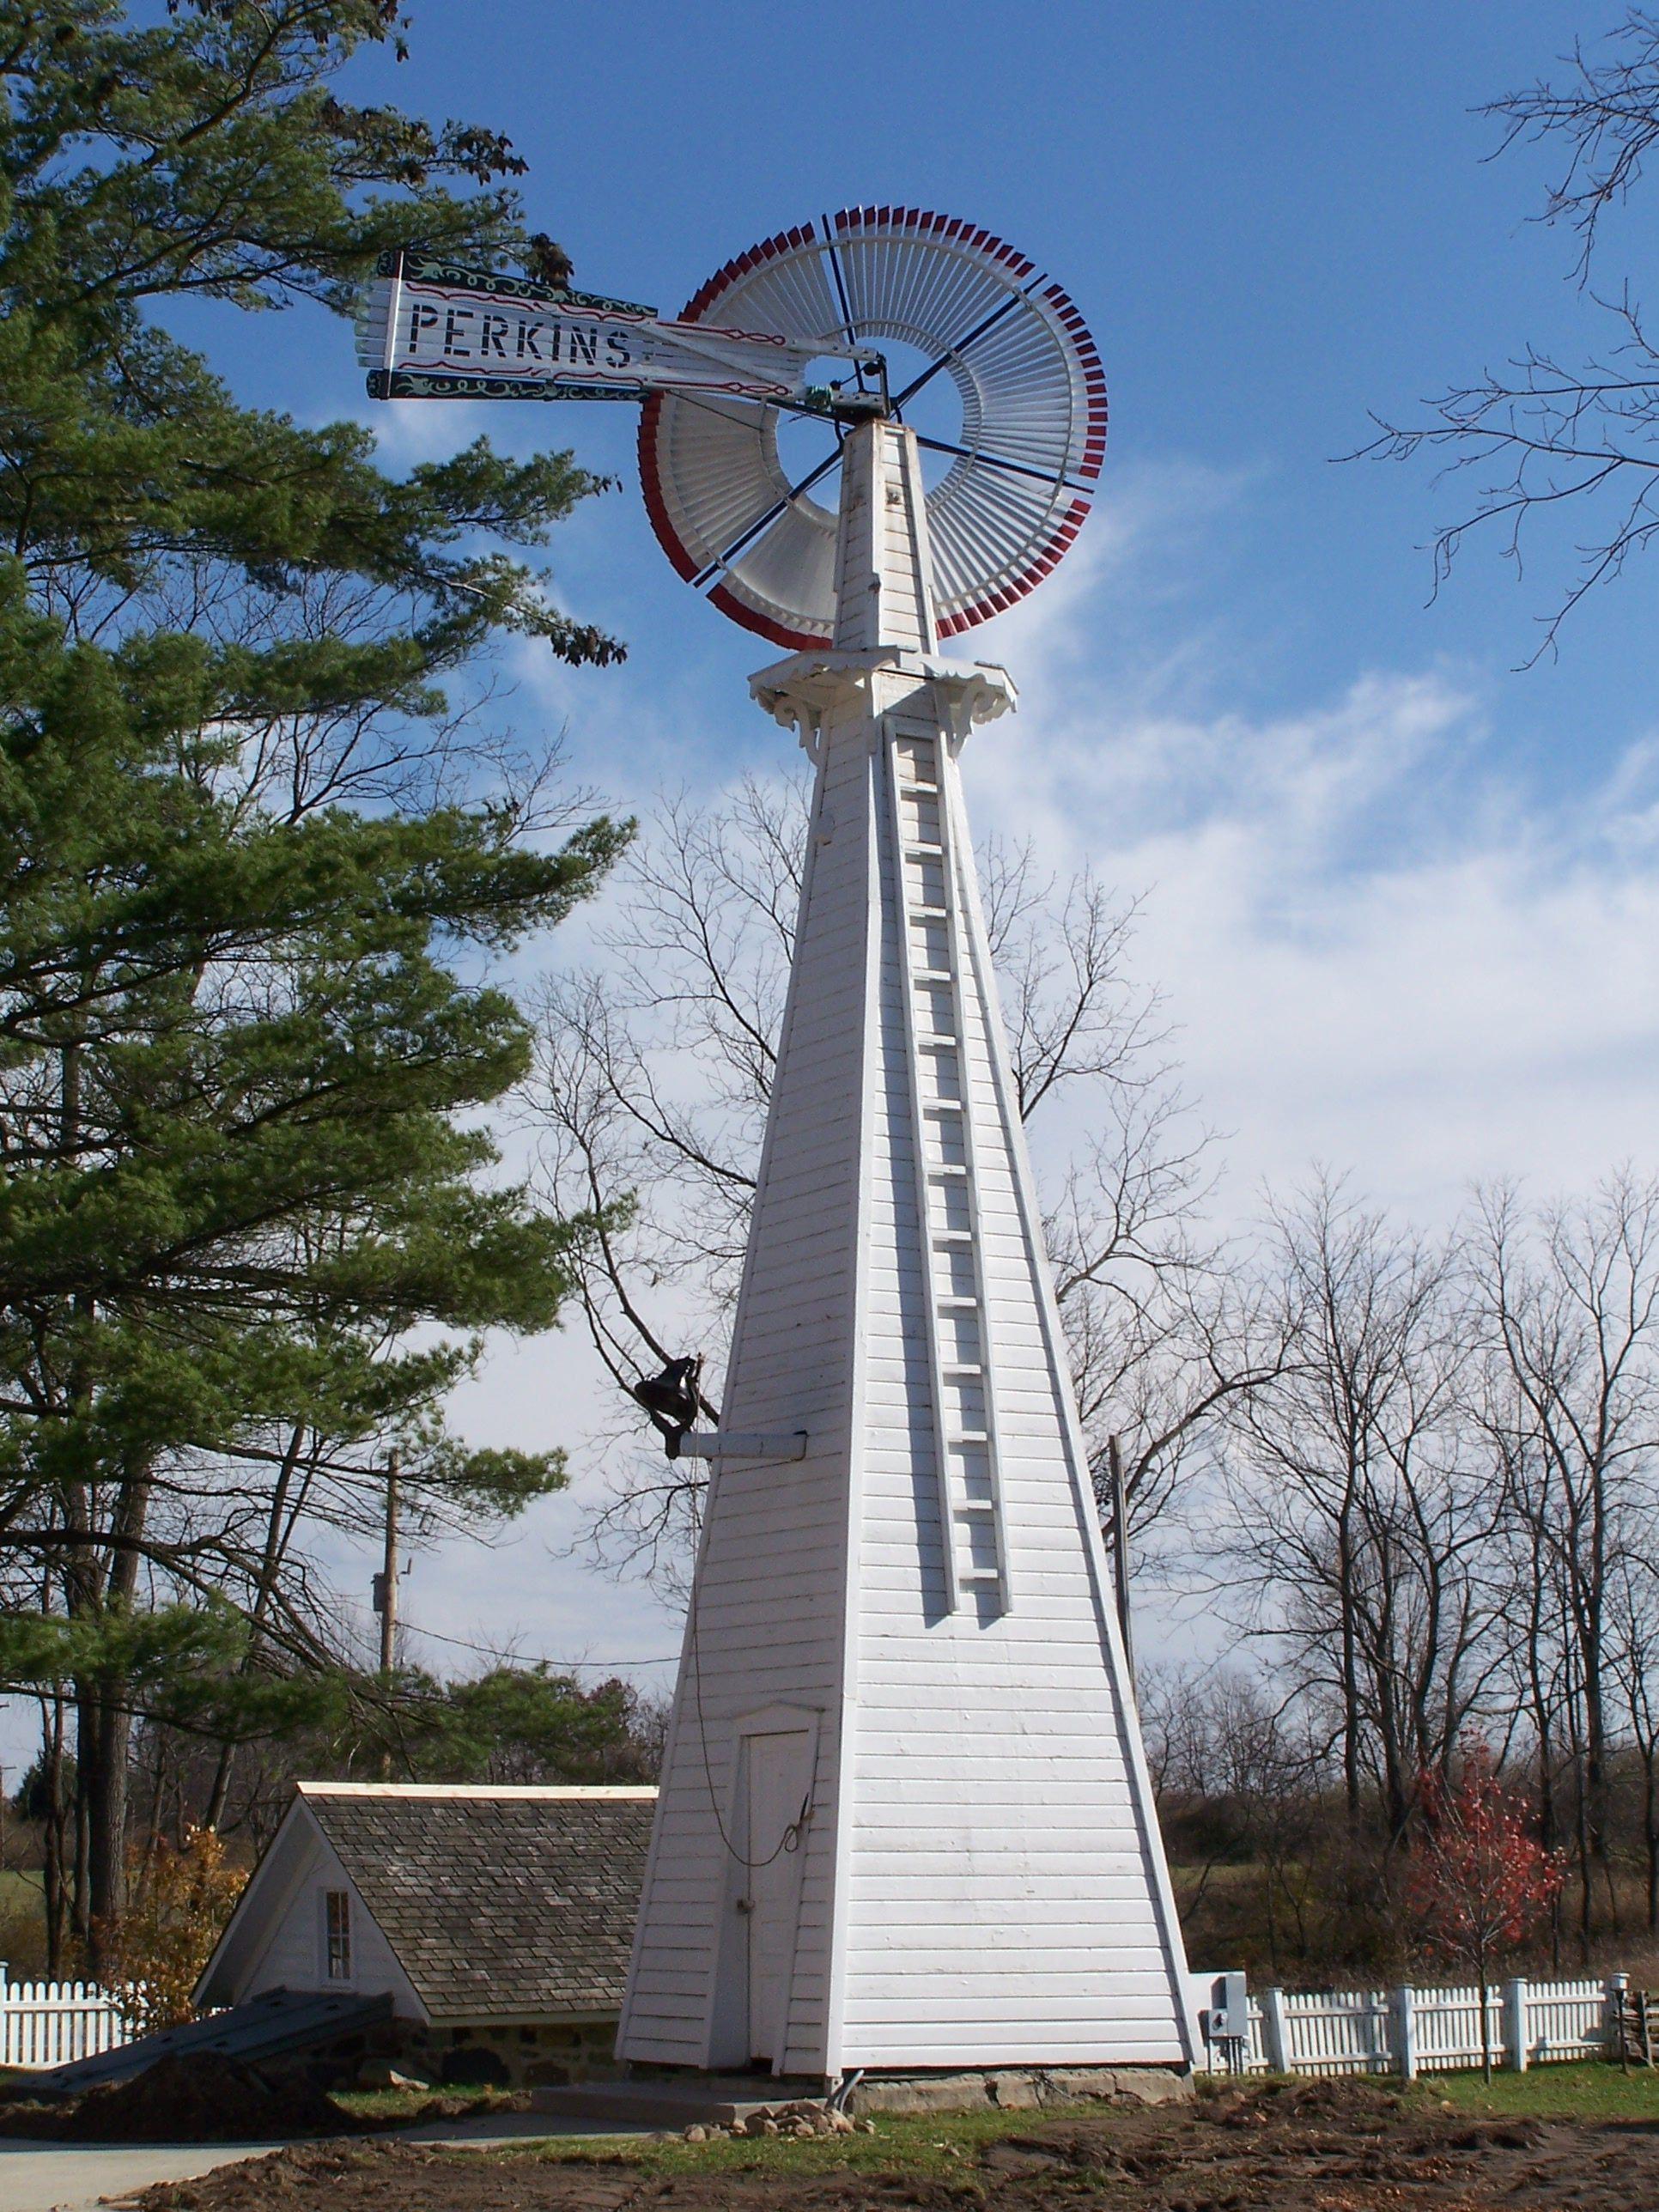 Perkins Windmill at the Waterloo Area Farm Museum near